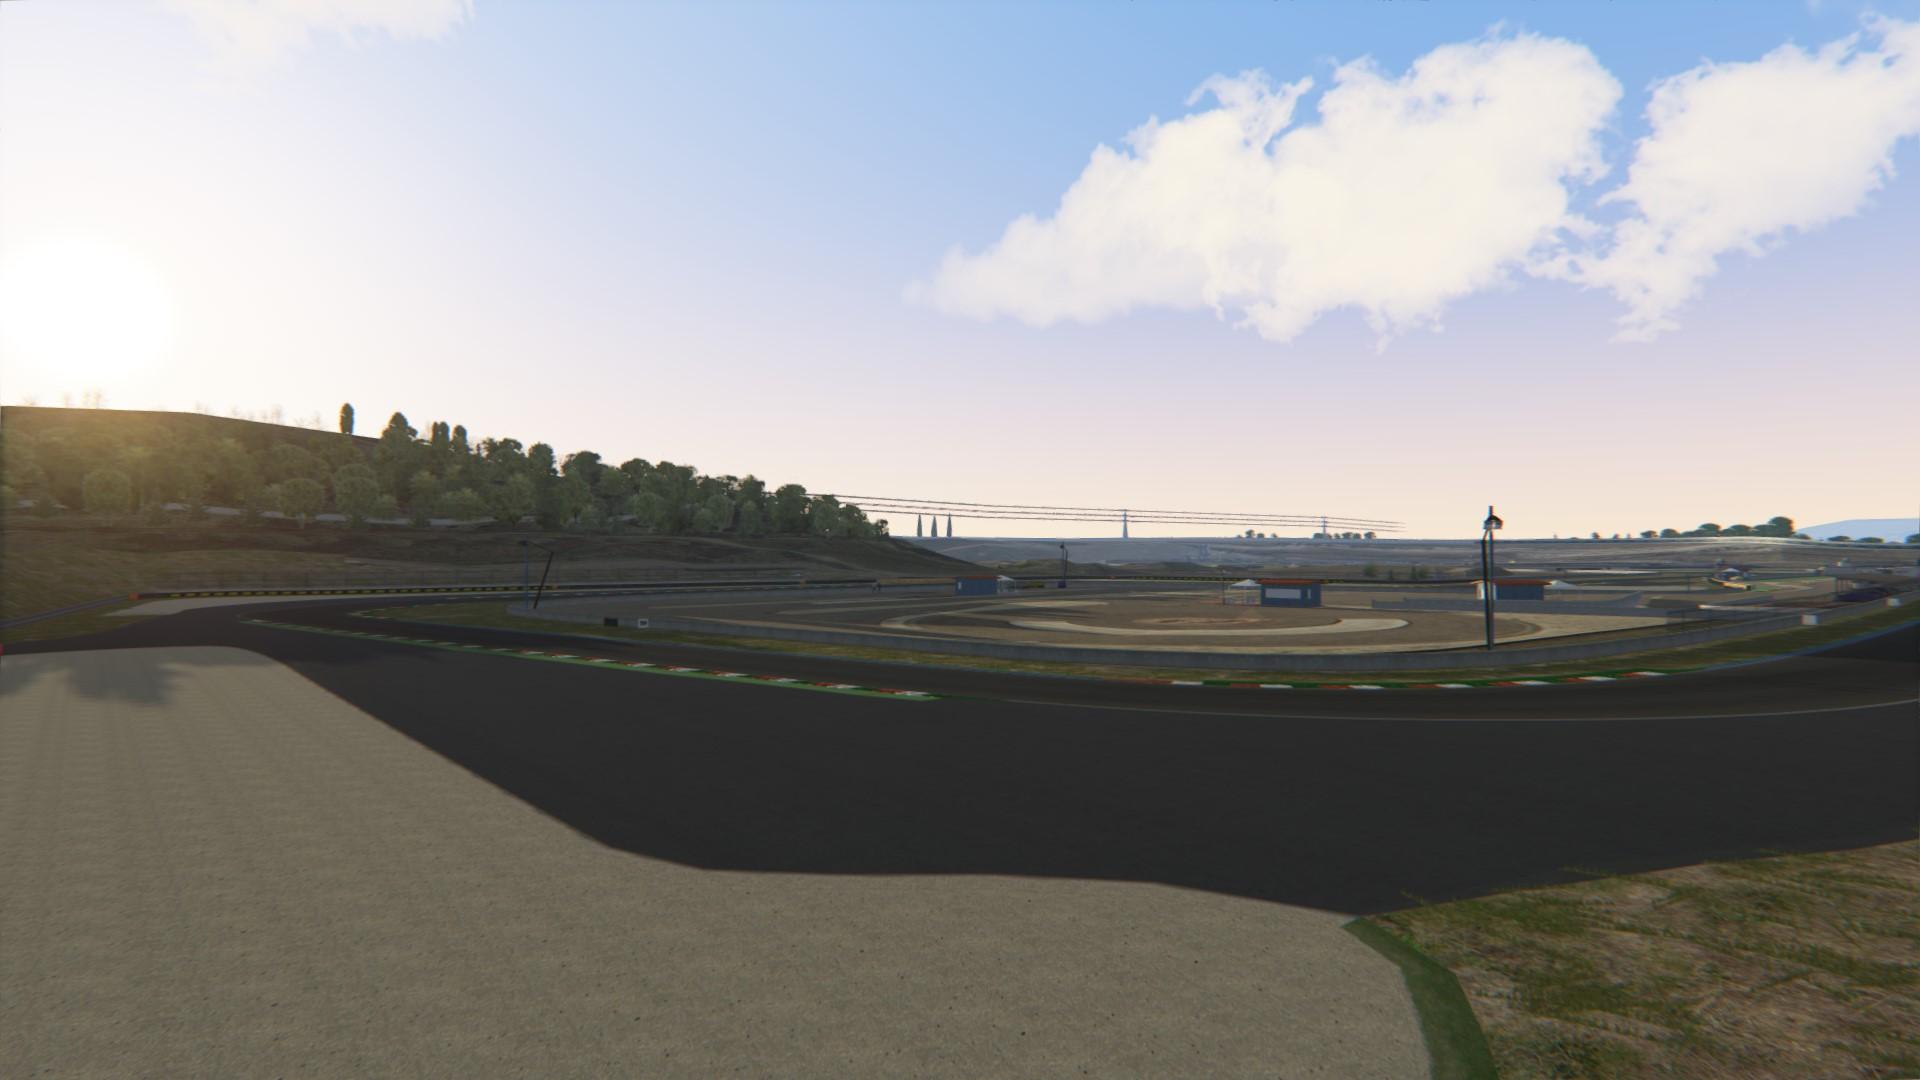 Screenshot_ks_toyota_ae86_autodromo_di_franciacorta_1-6-116-0-34-44.jpg